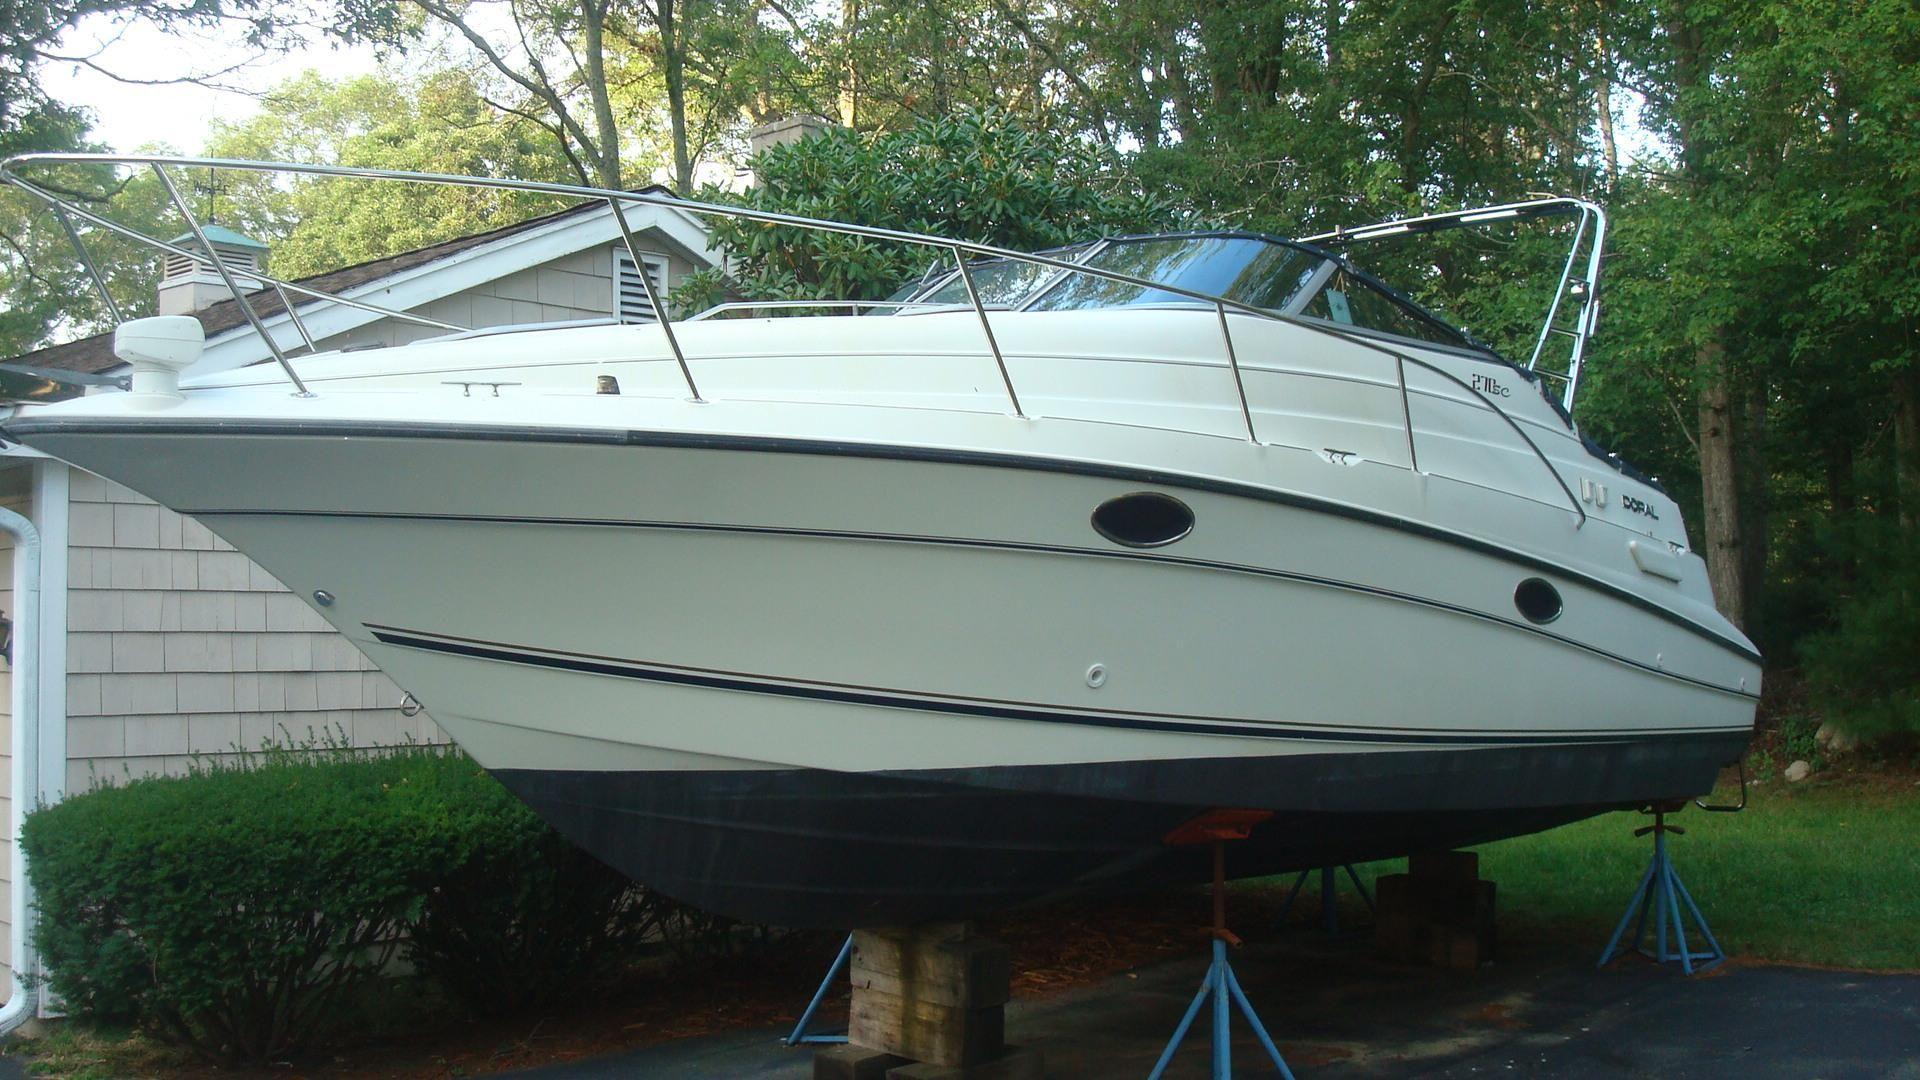 1996 doral 270 sc power boat for sale for Boat motors for sale in sc